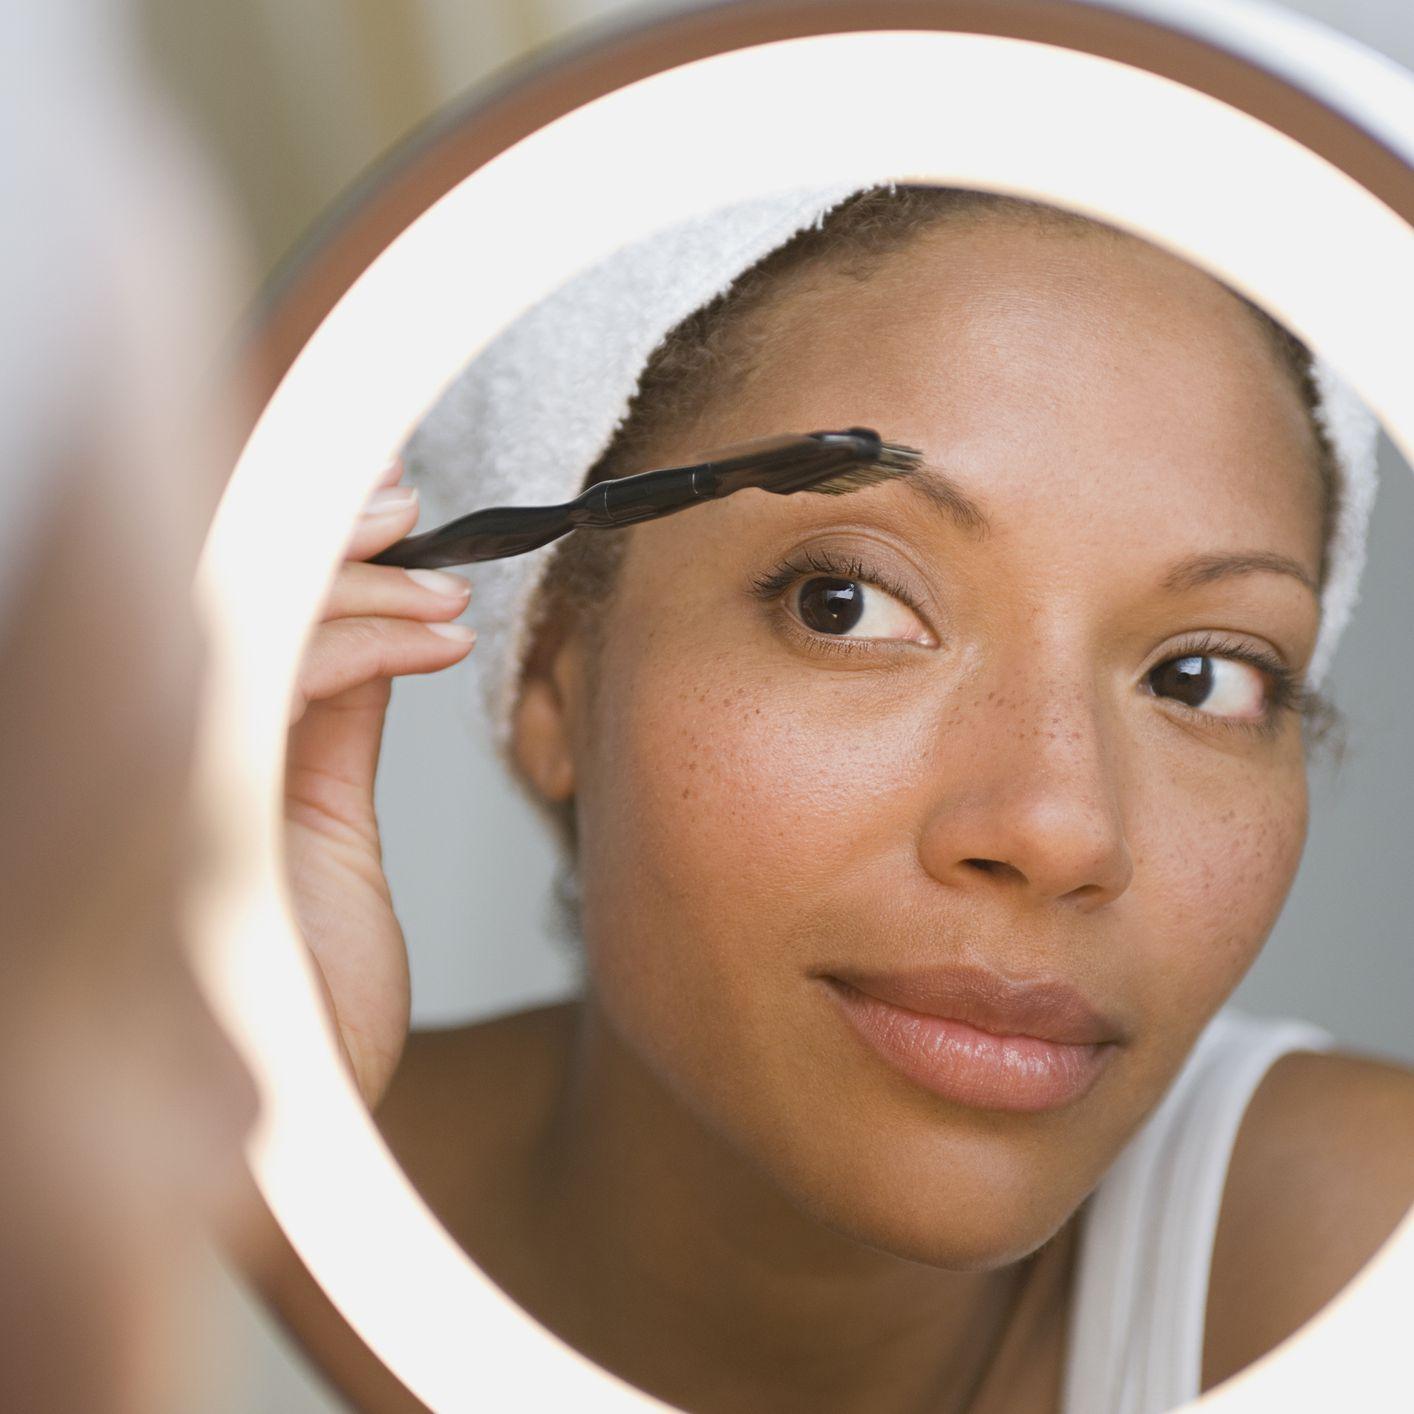 woman grooming brows in beauty mirror